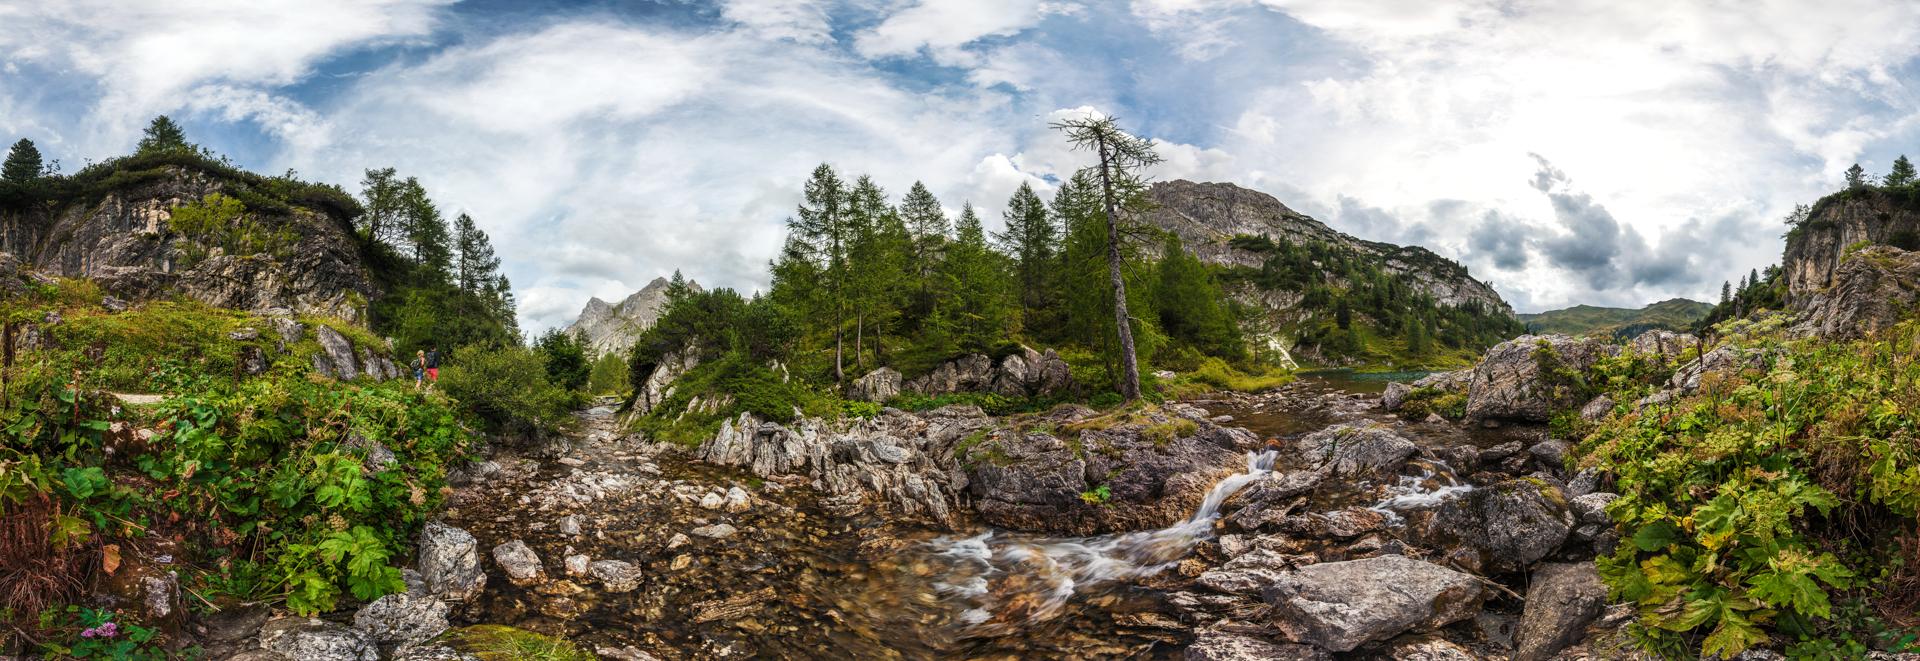 Tappenkarsee in Kleinarl in Salzburg